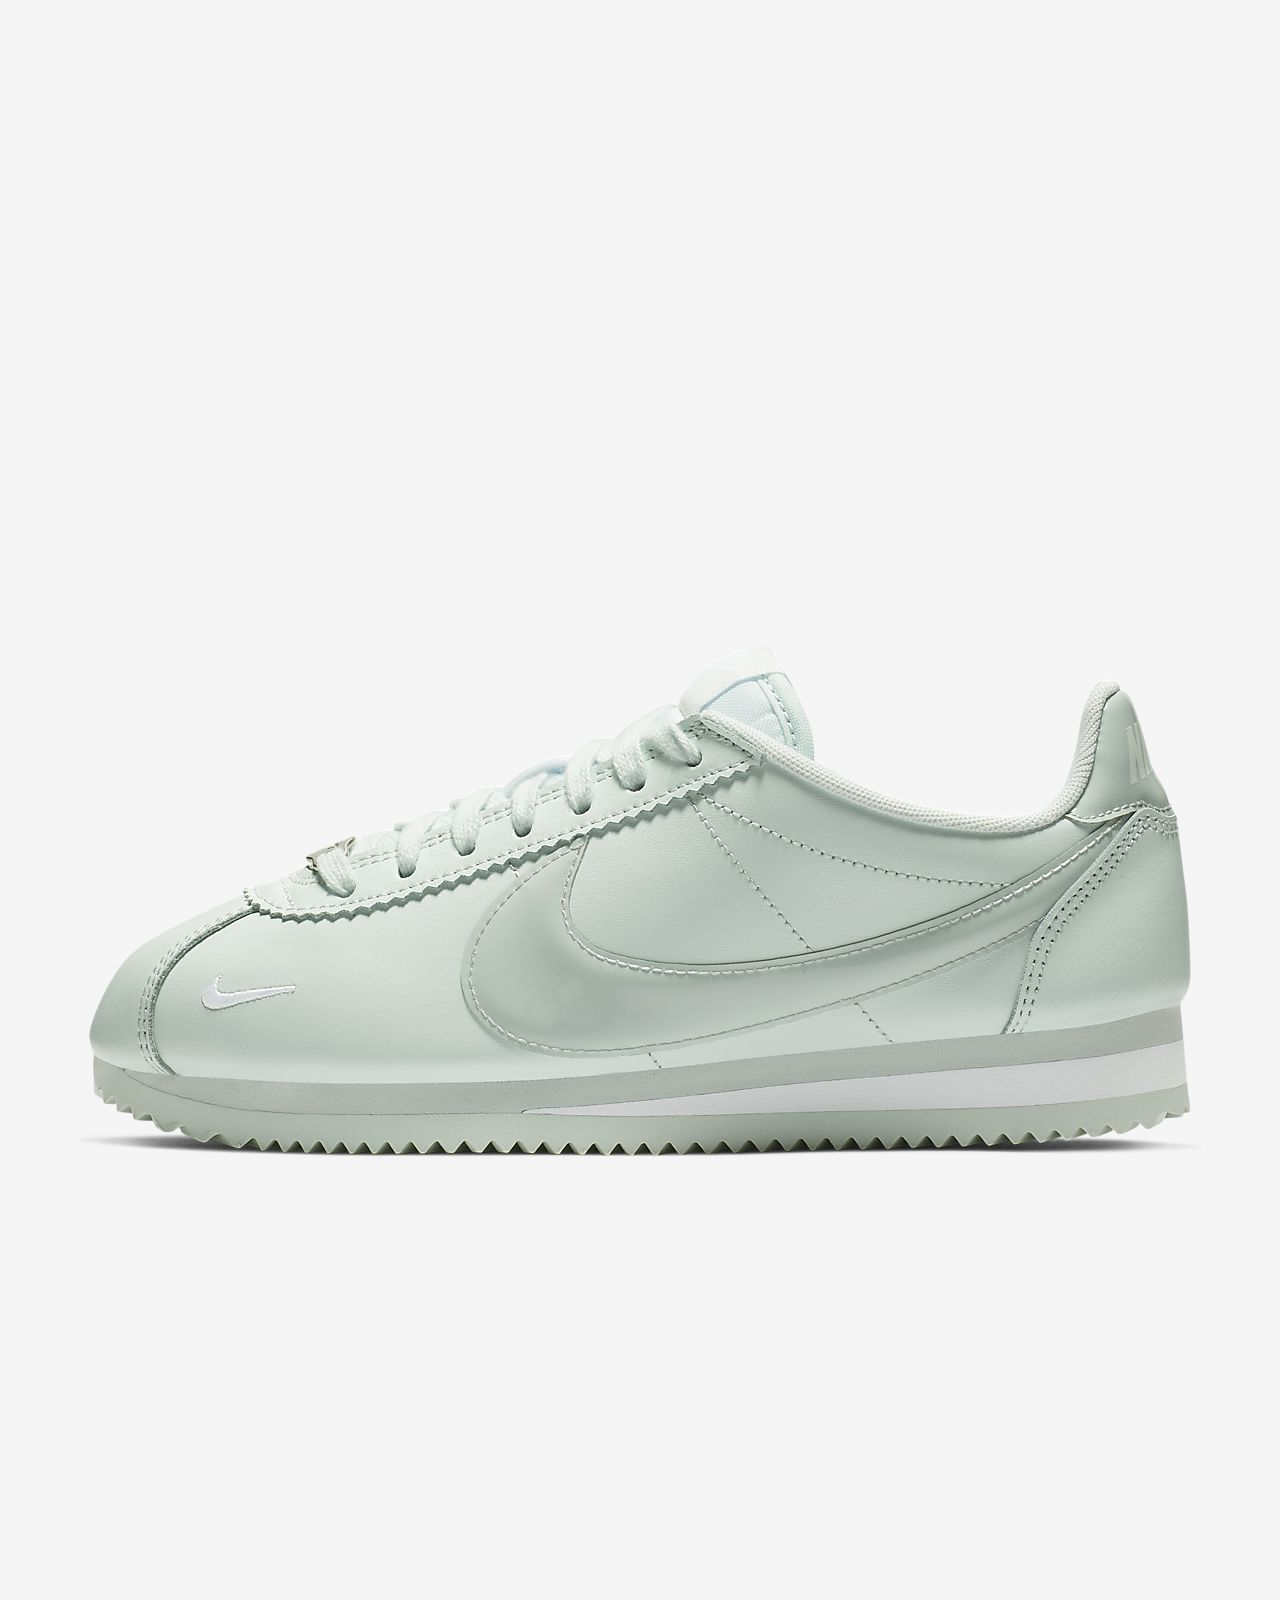 watch 7f75d bc853 Women s Shoe. Nike Classic Cortez Premium